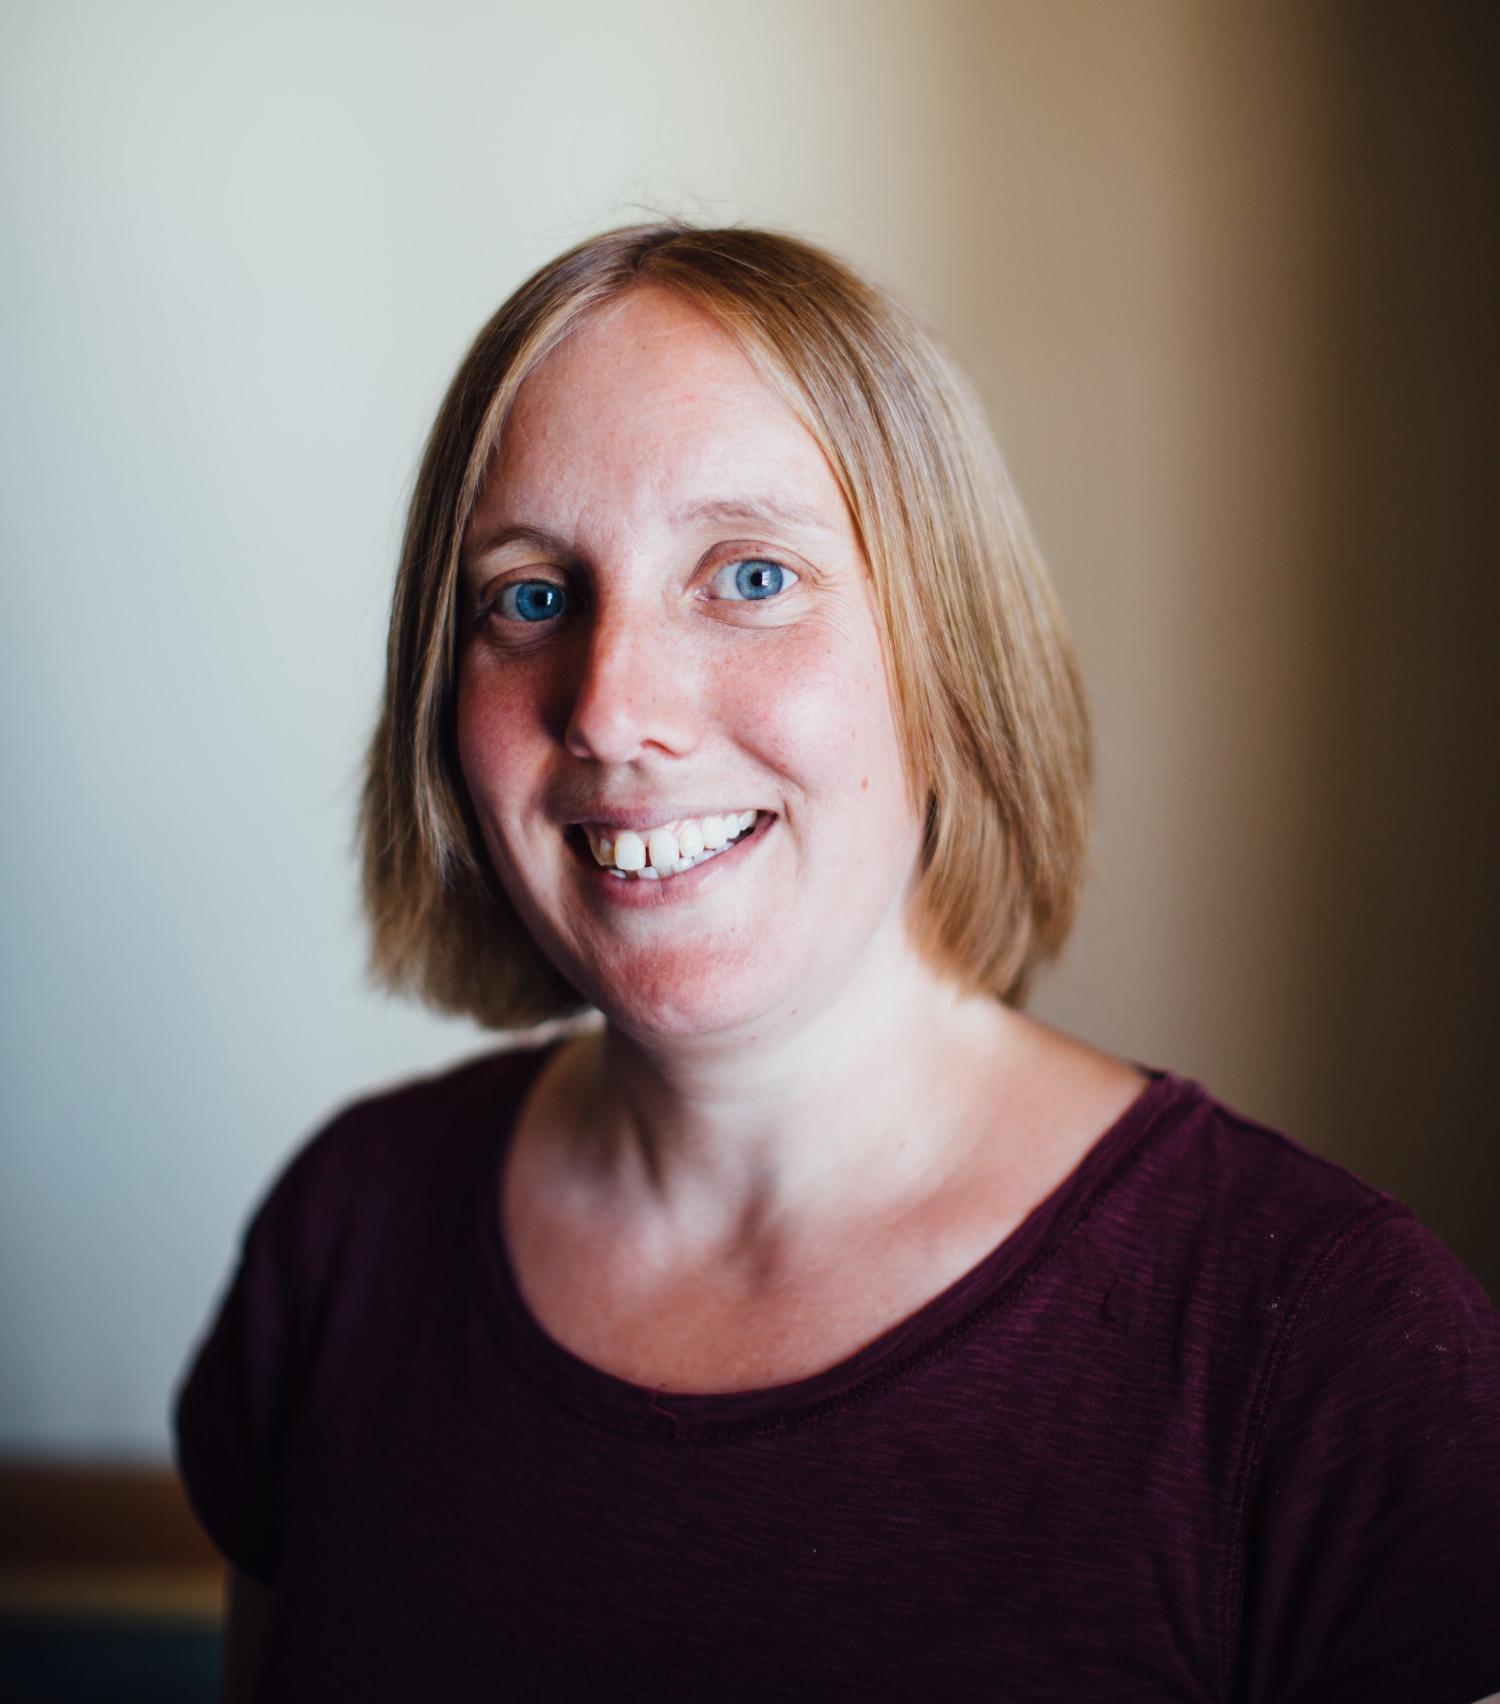 Children's Safeguarding Officer - Rachel Allen